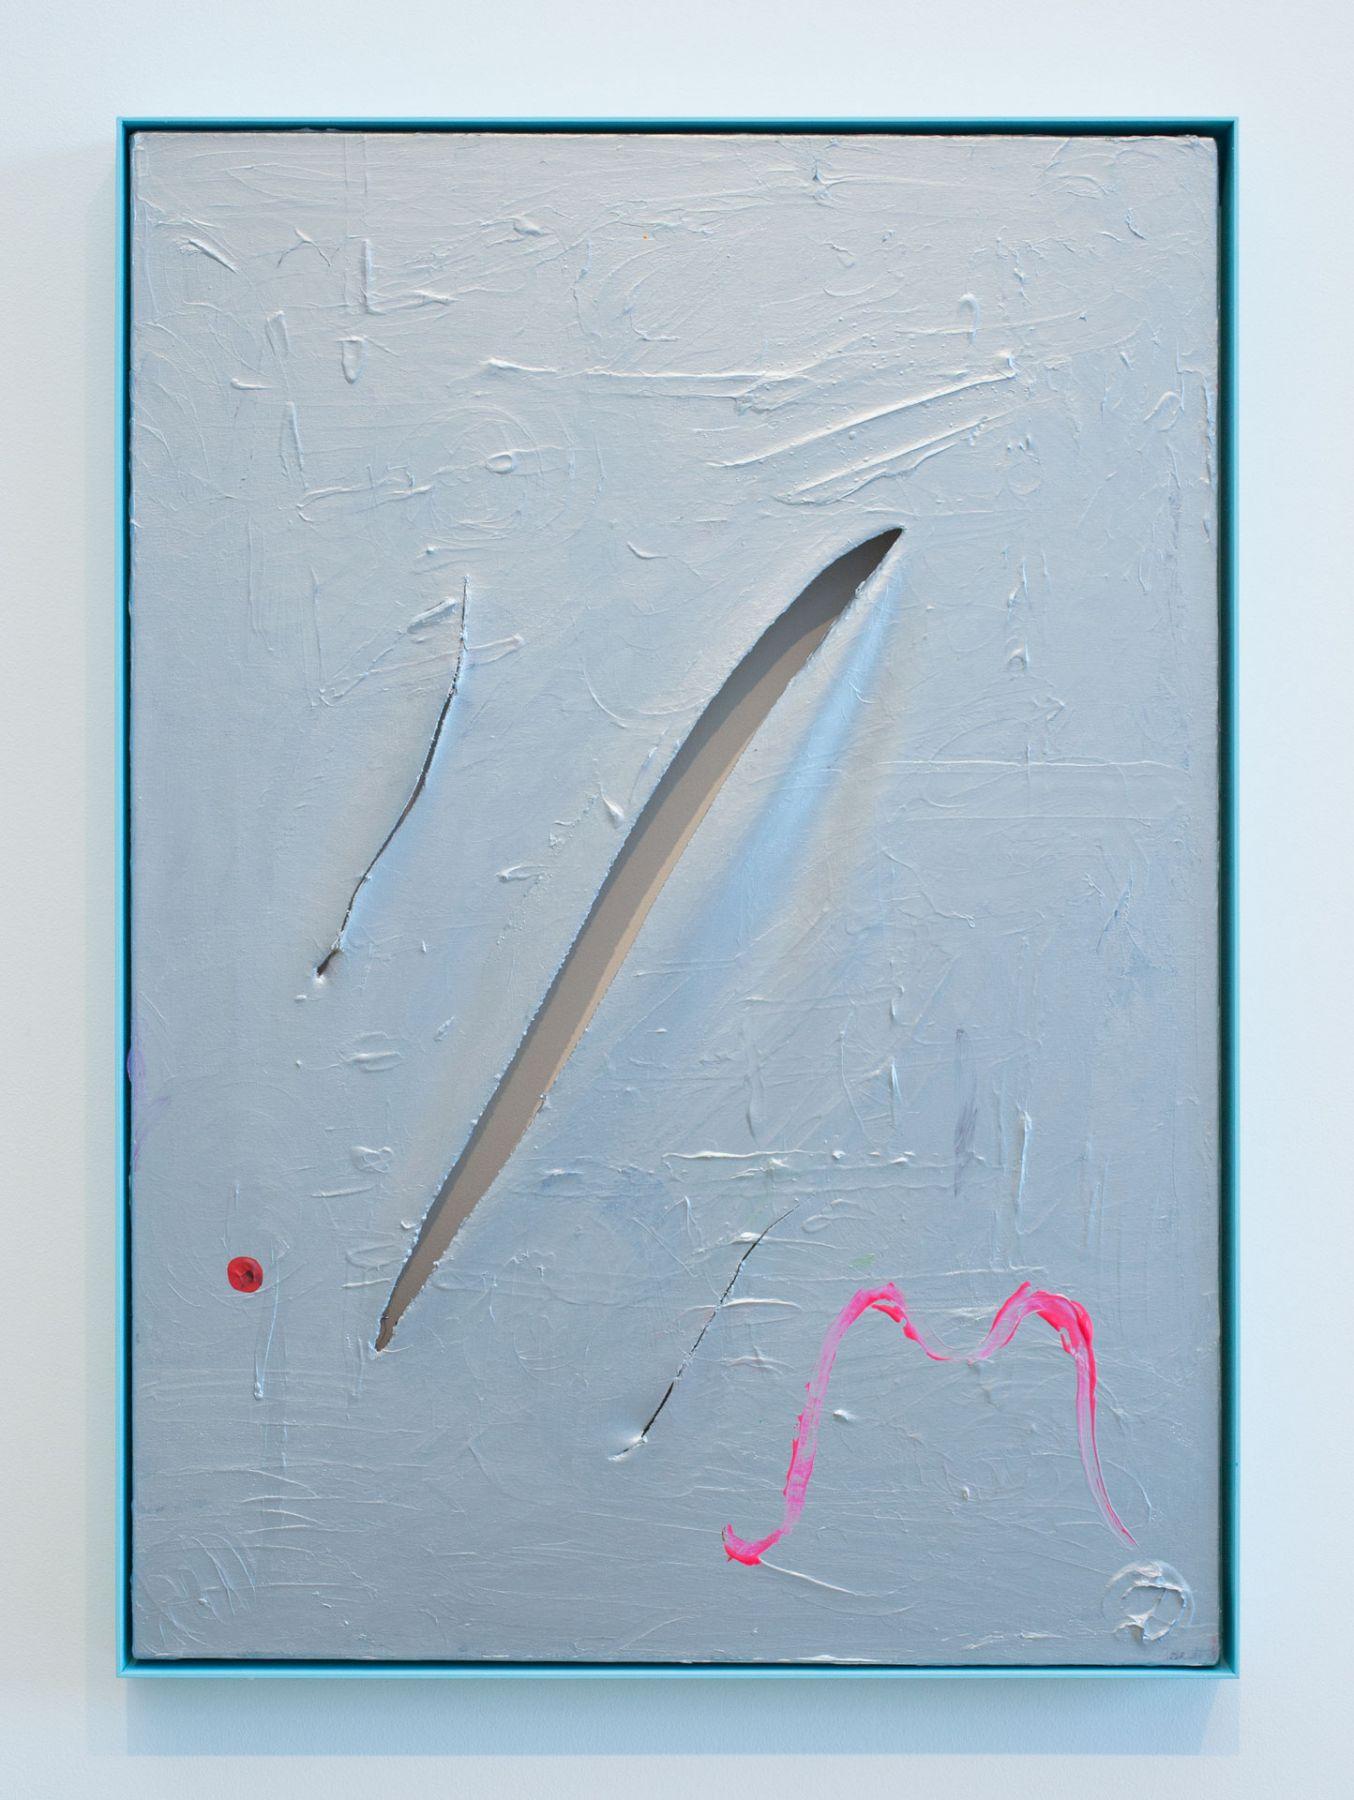 Sue Tompkins, M